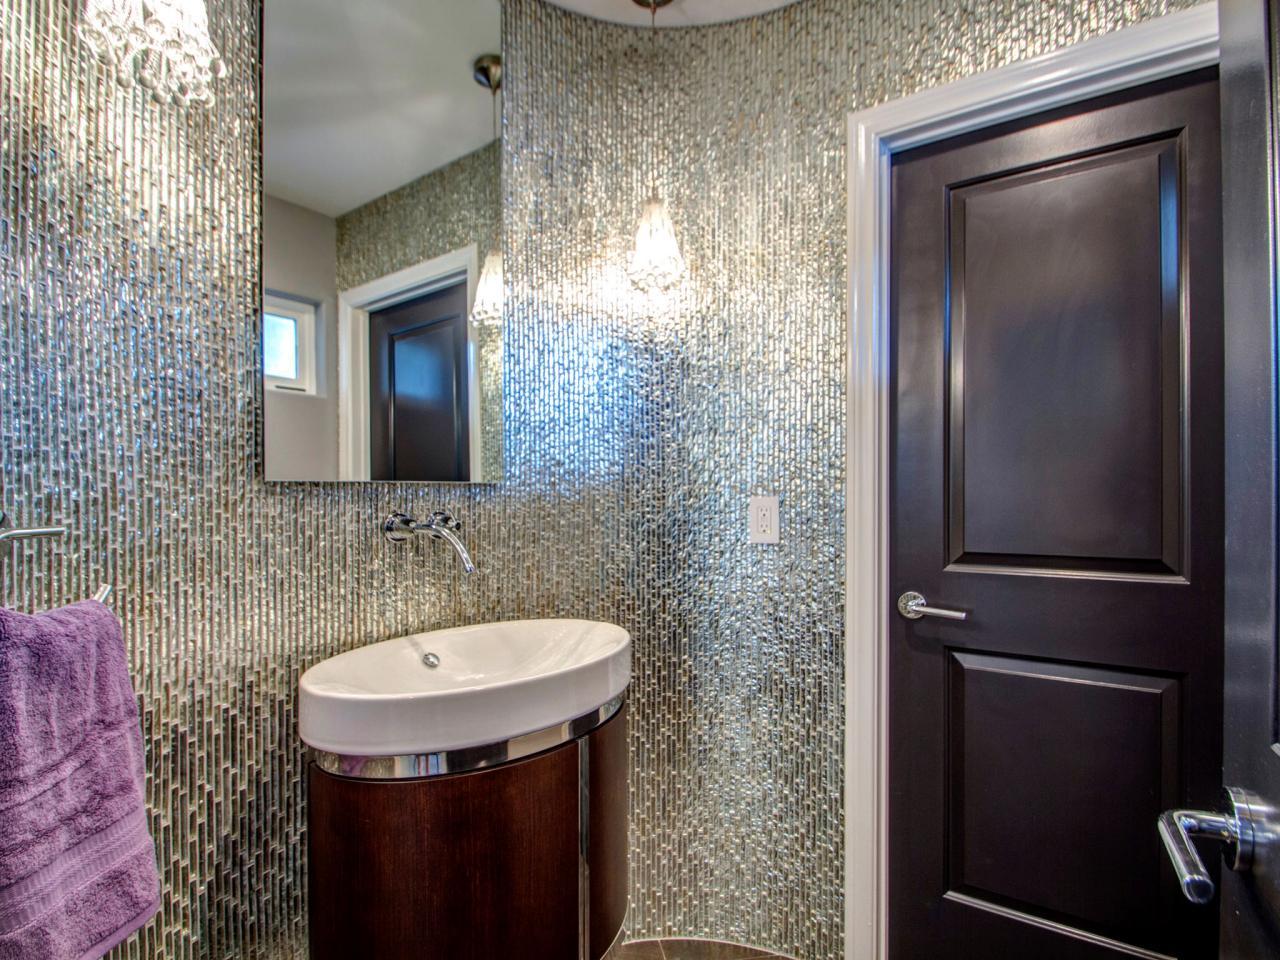 DP_Jackson-Design-And-Remodeling-gray-contemporary-bathroom-tile_v.jpg.rend.hgtvcom.1280.960